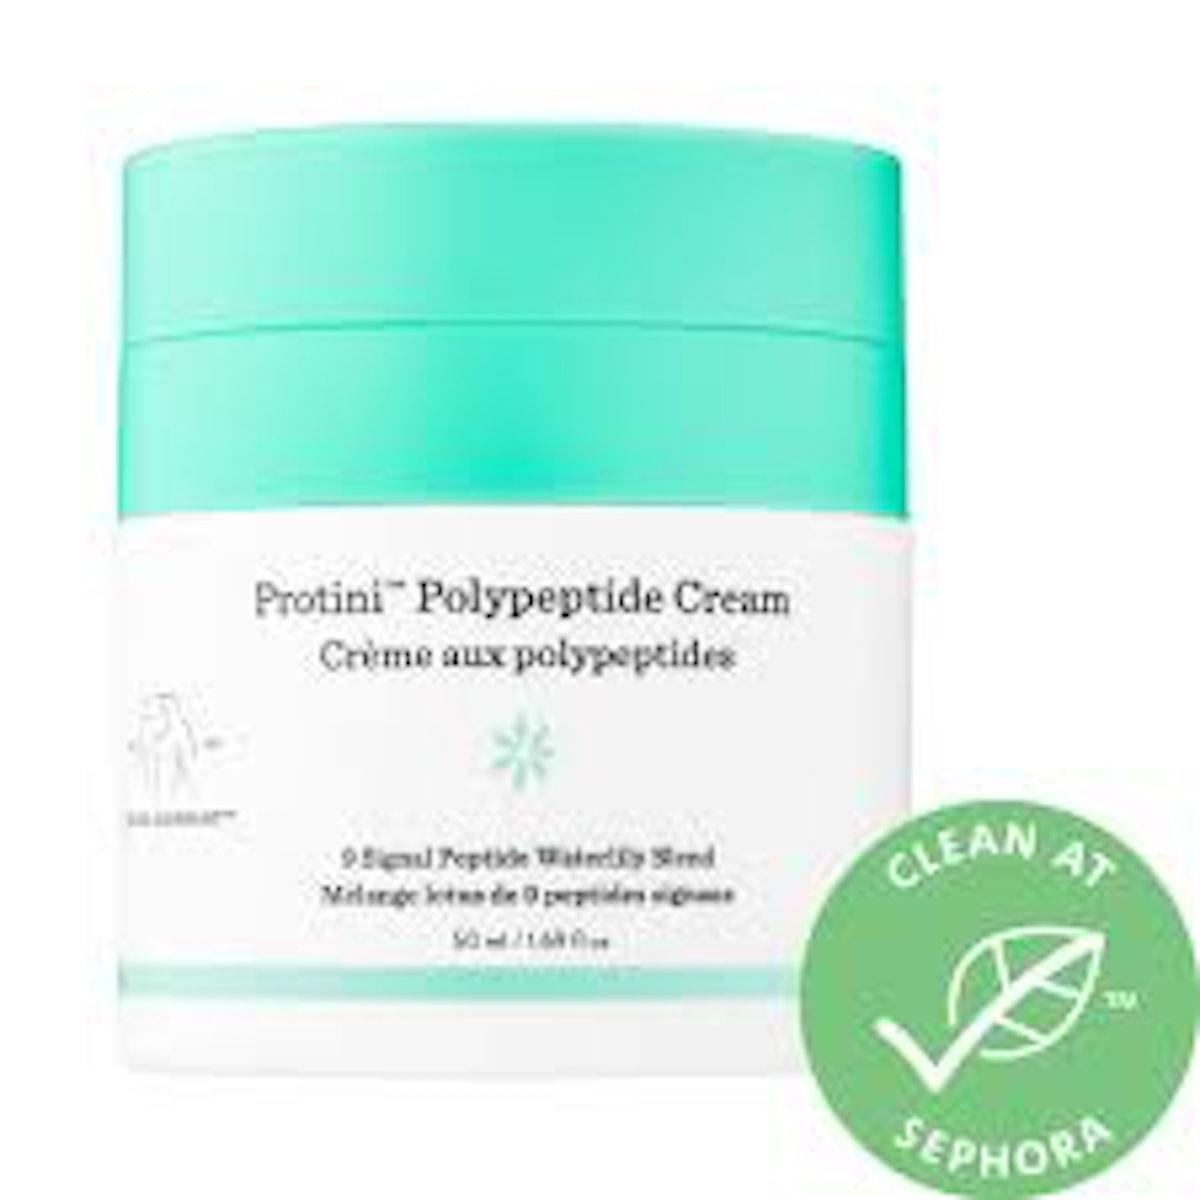 Drunk Elephant Protini™ Polypeptide Cream